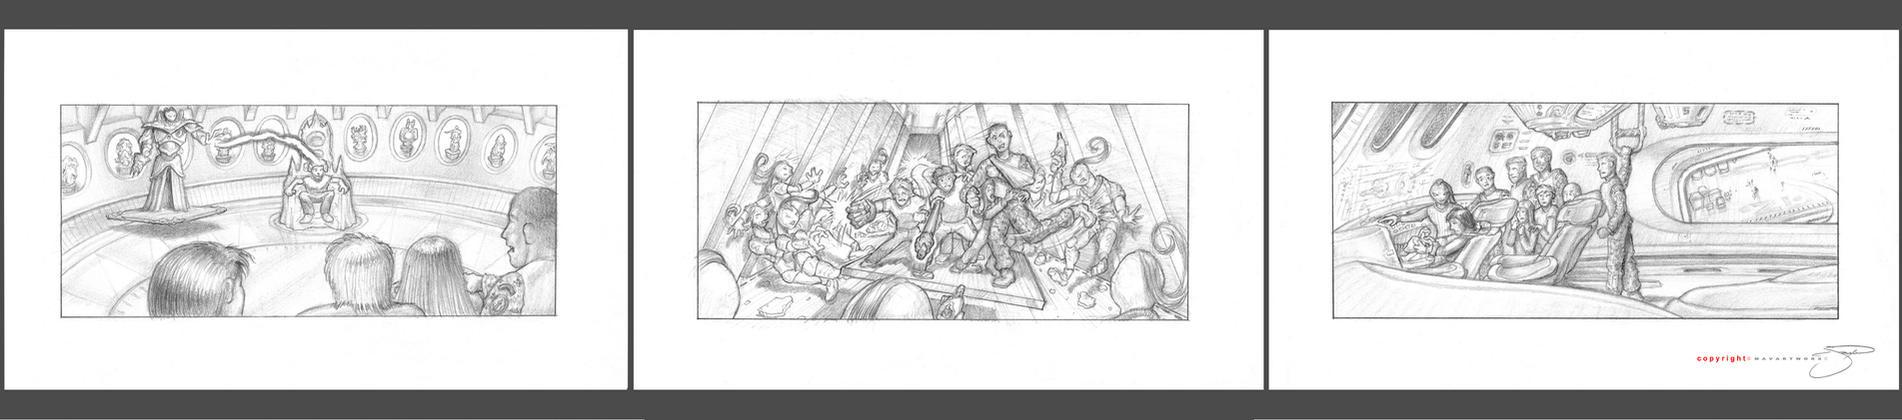 Jr Crew Concept Boards II by mavartworx